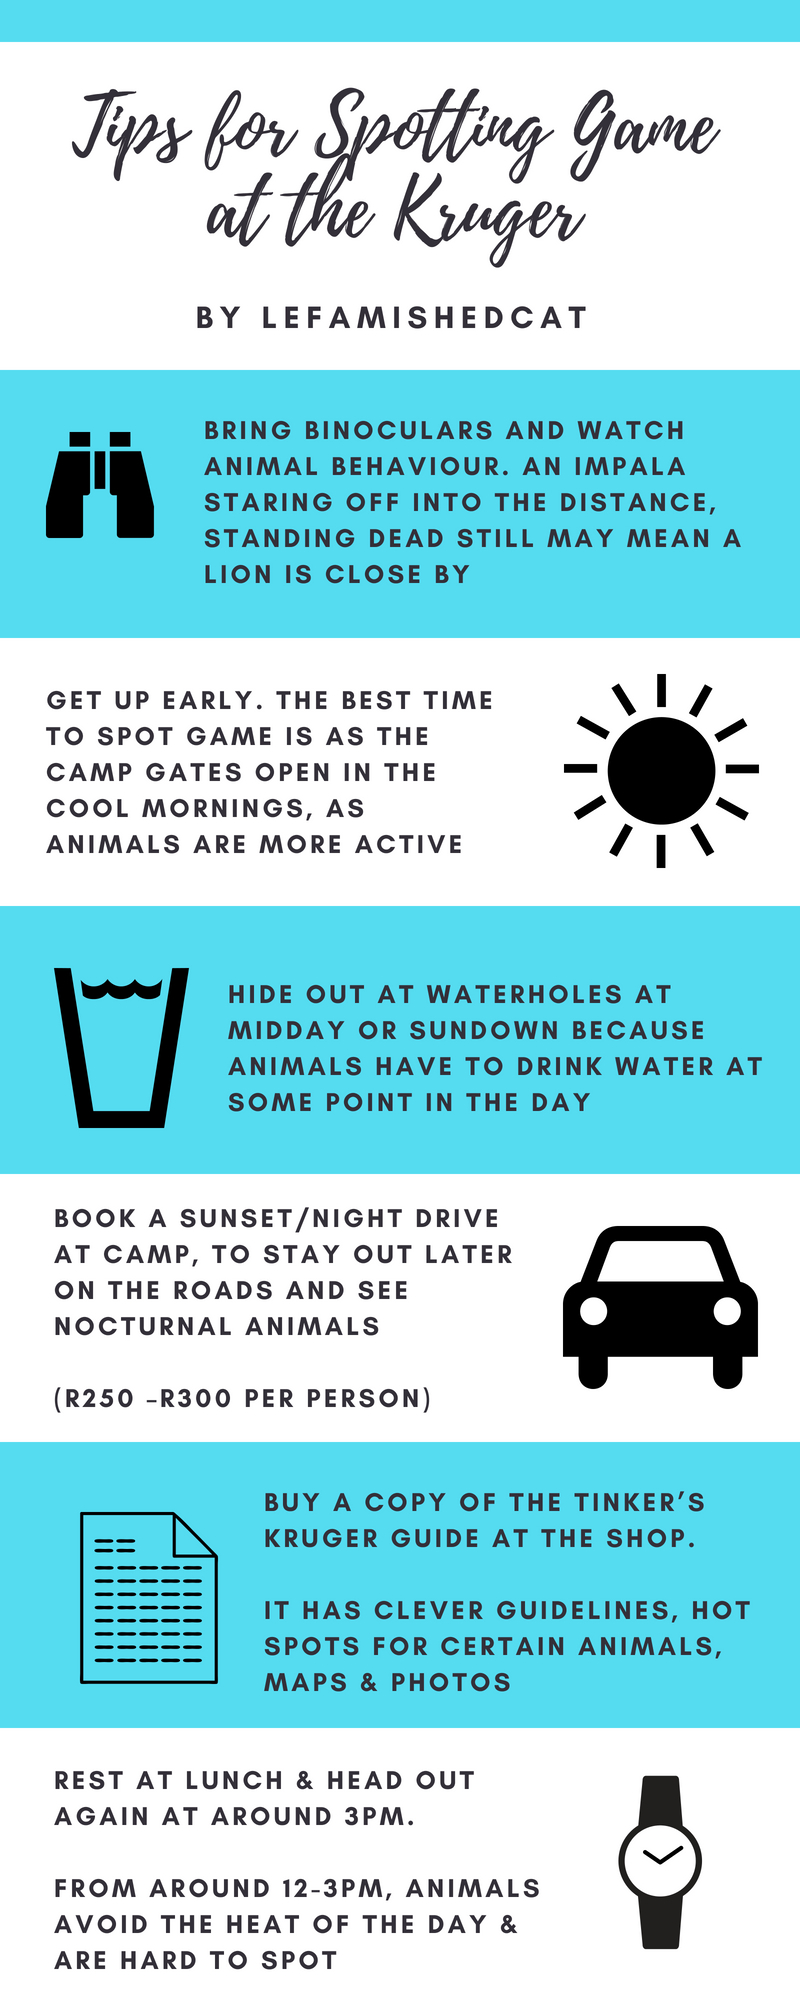 Spotting Game Tips